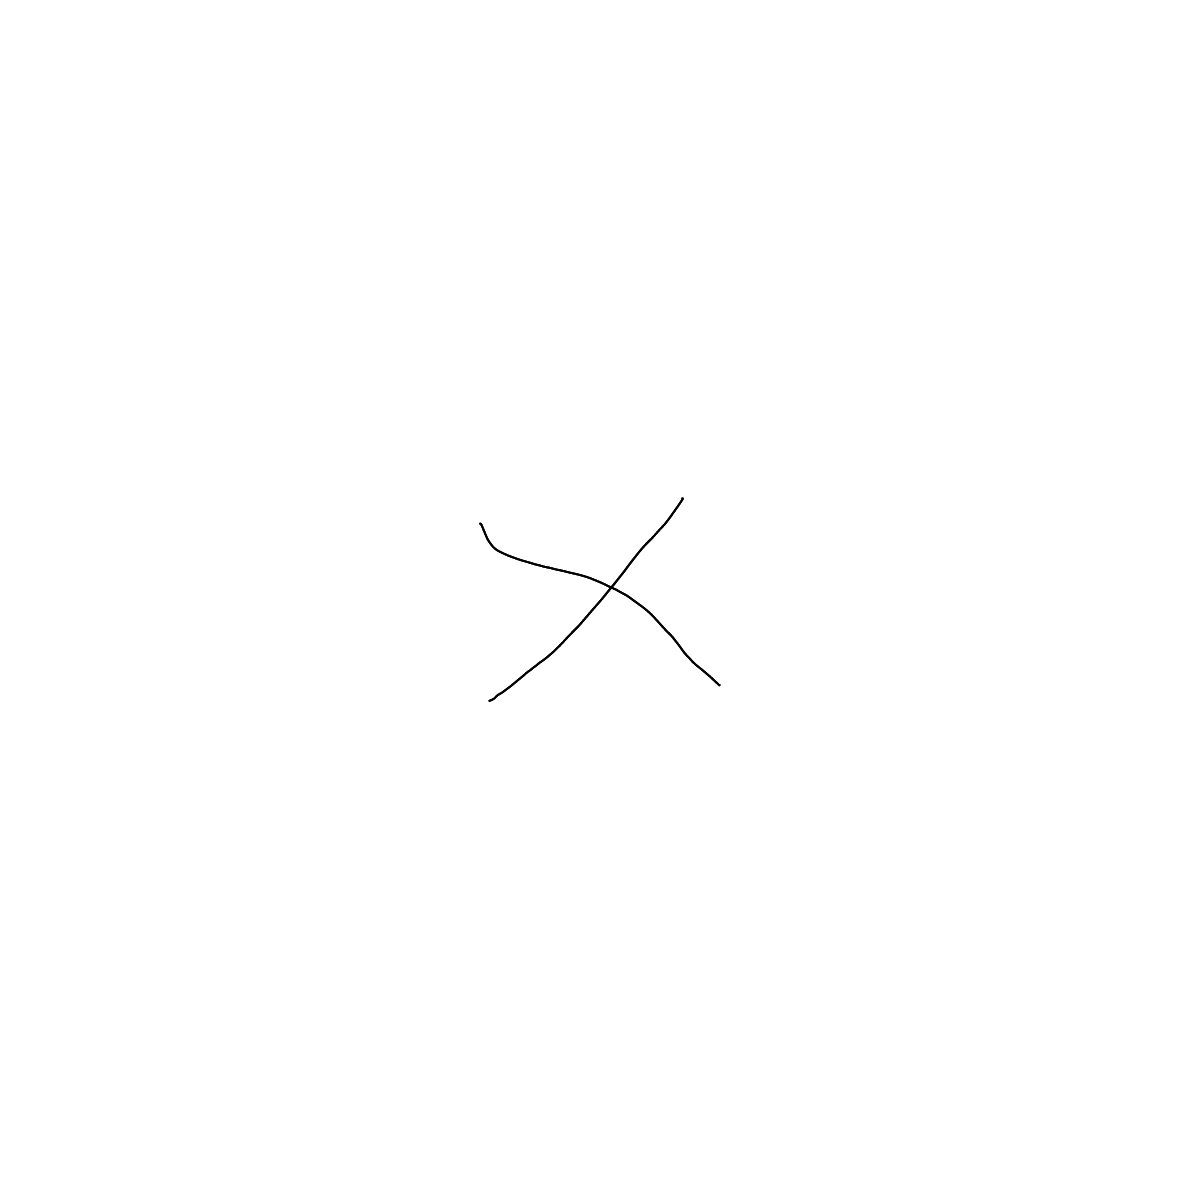 BAAAM drawing#7220 lat:32.8412094116210940lng: -96.1385574340820300